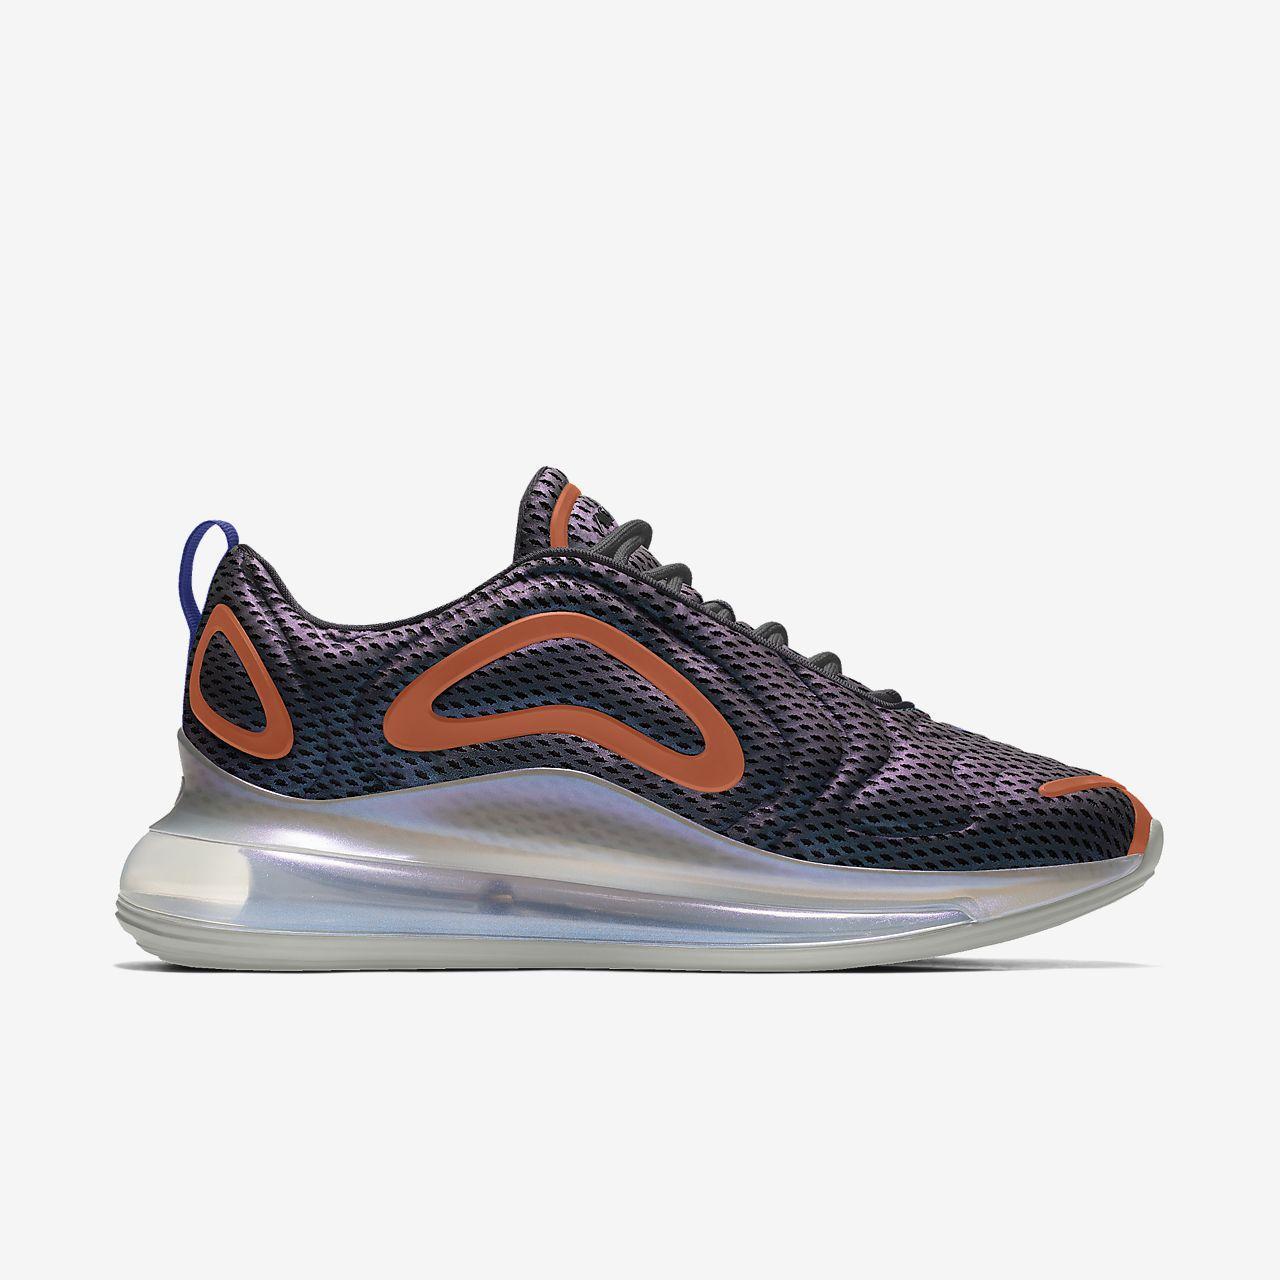 Nike Air Max 720 By You egyedi utcai női cipő